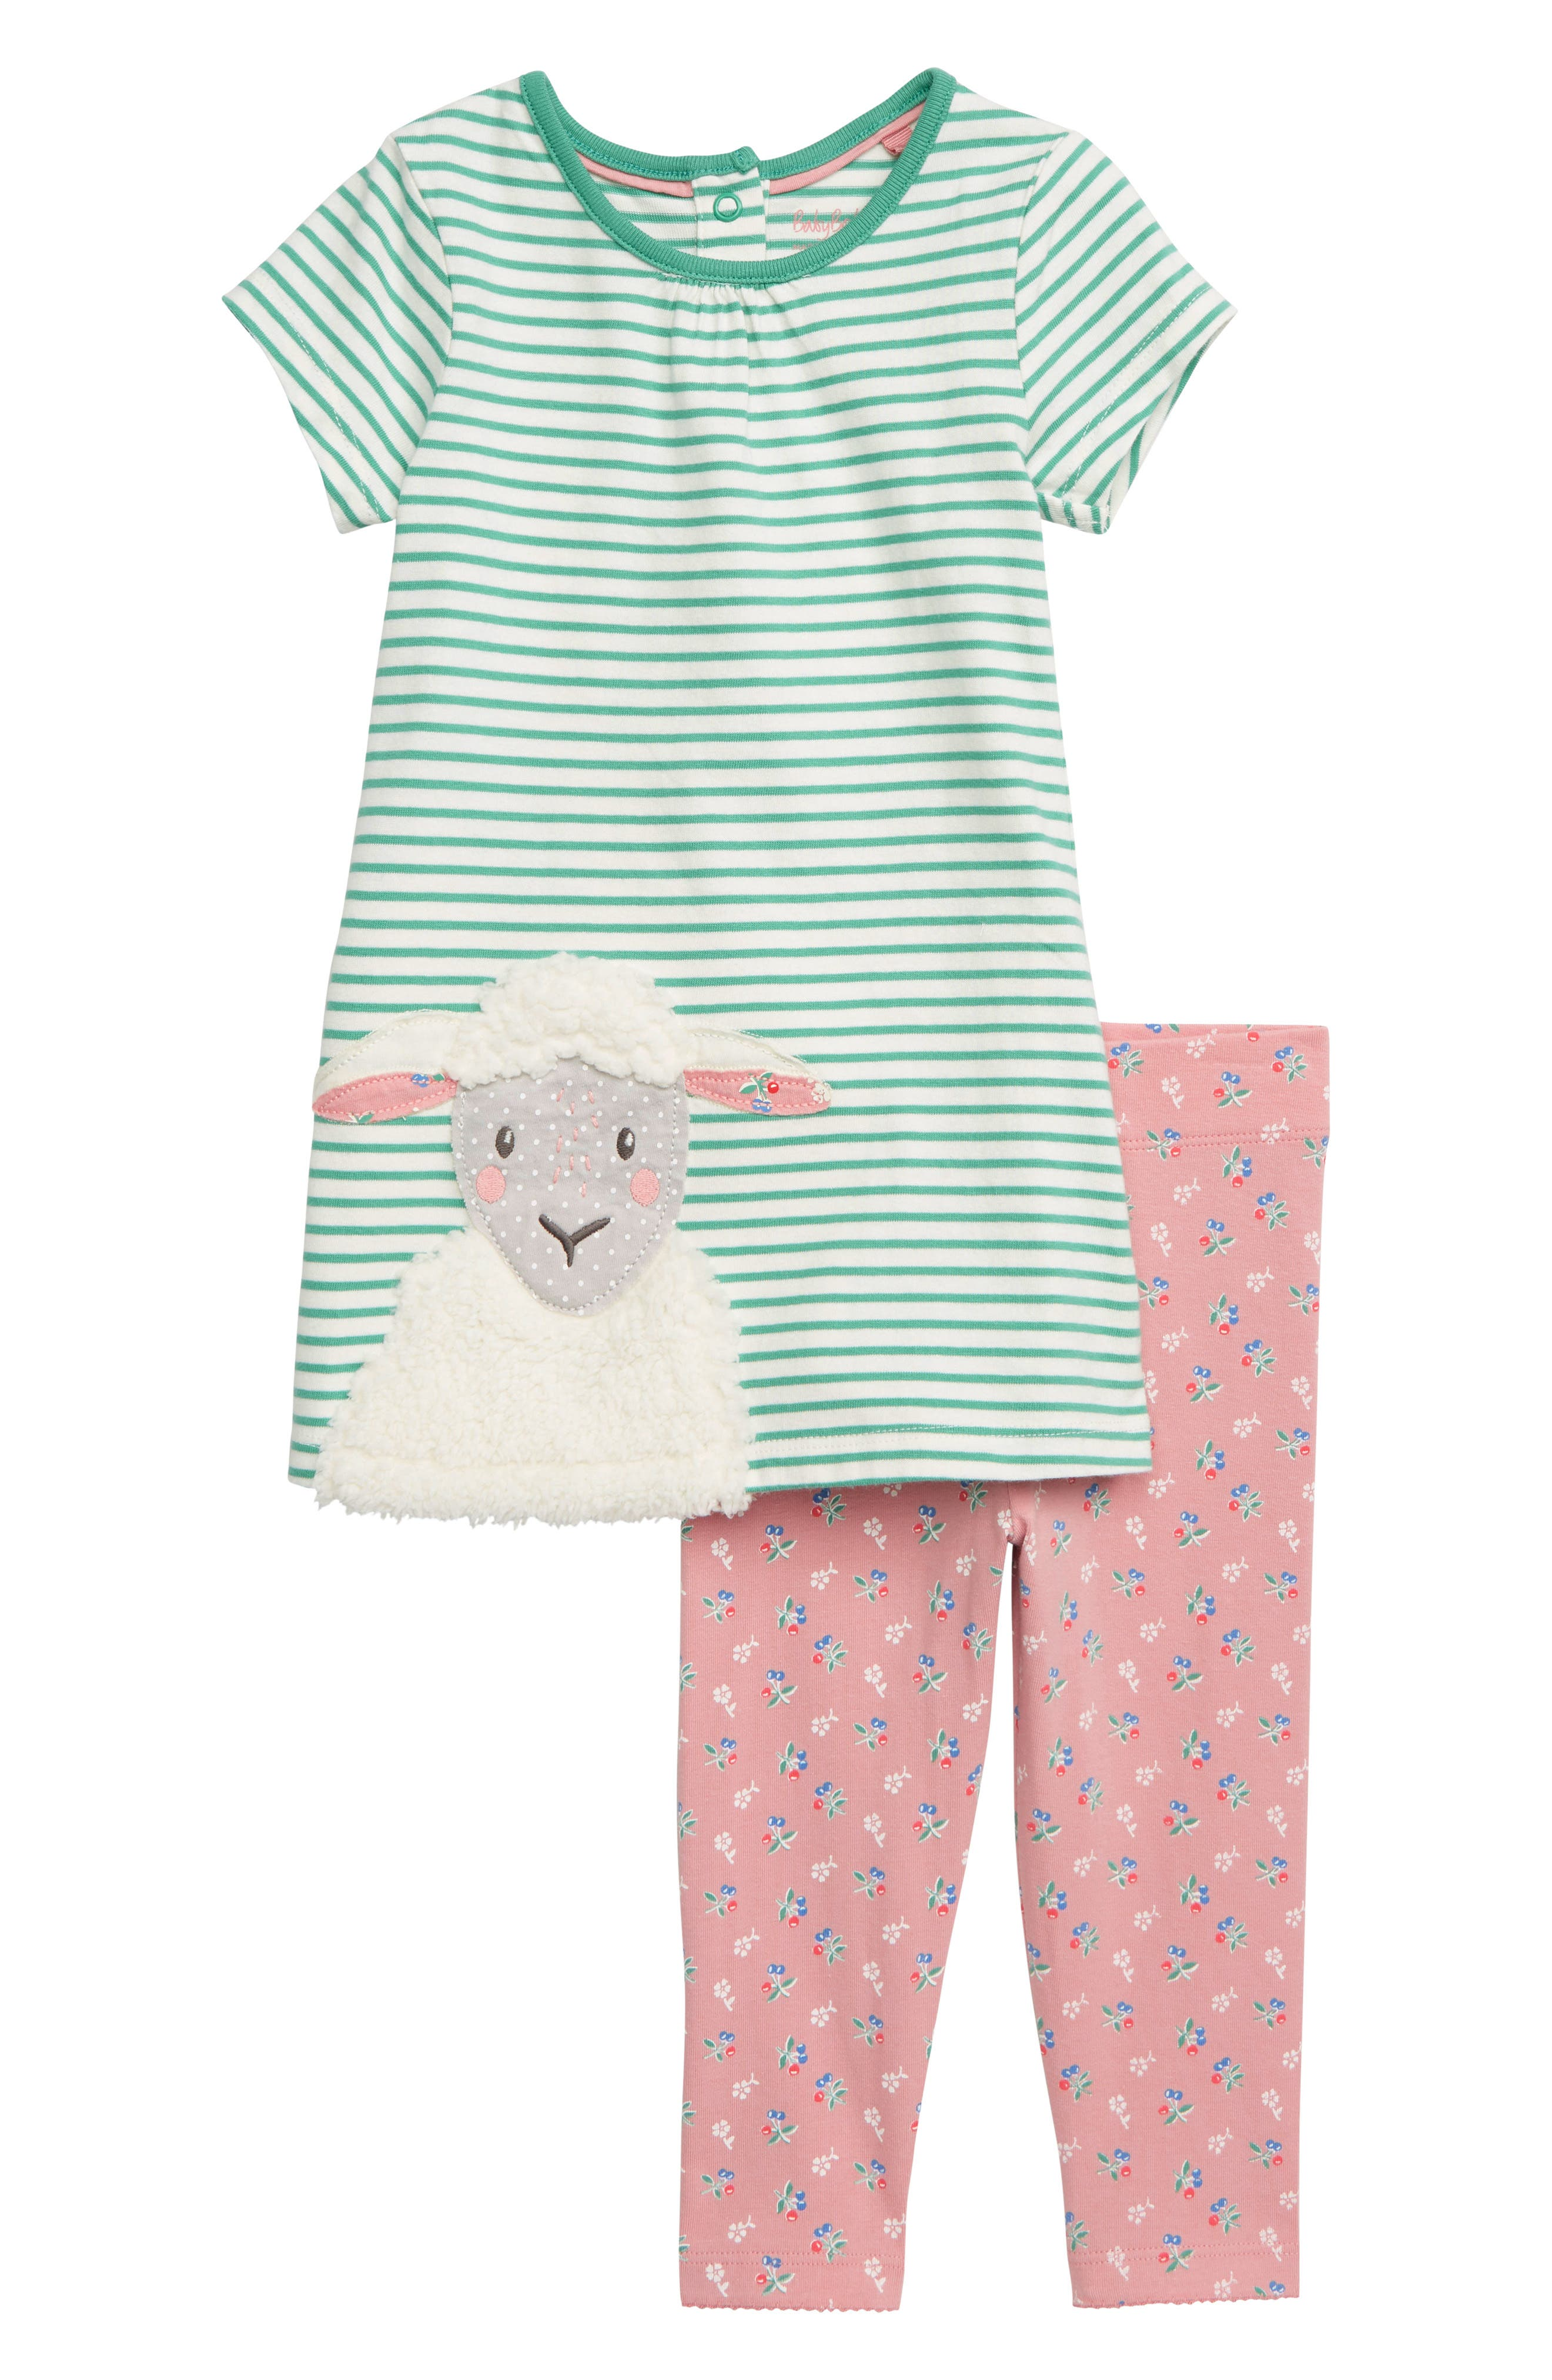 Toddler Girls Mini Boden Farmyard Dress  Leggings Set (Baby  Toddler Girls)